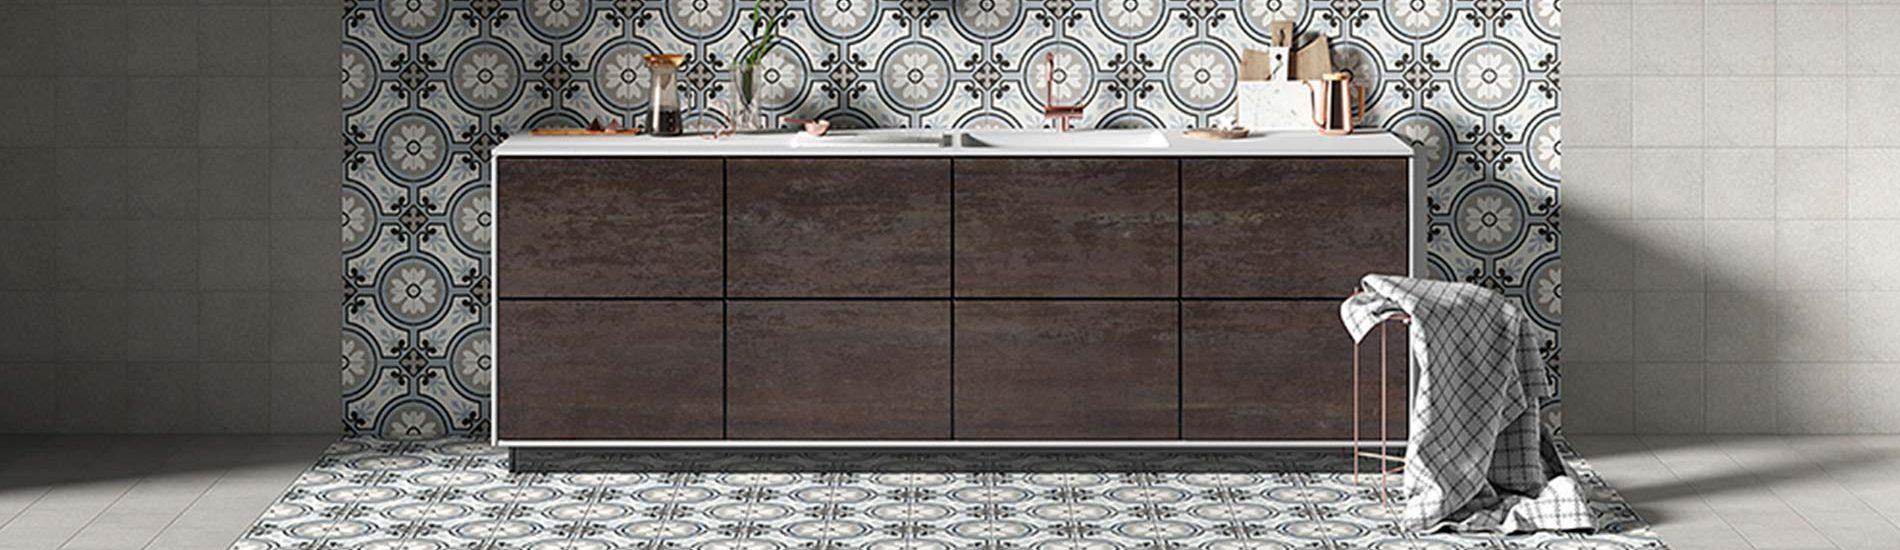 banner-reverie-italian-pattern-look-floor-wall-tile-anaheim-flooring-store